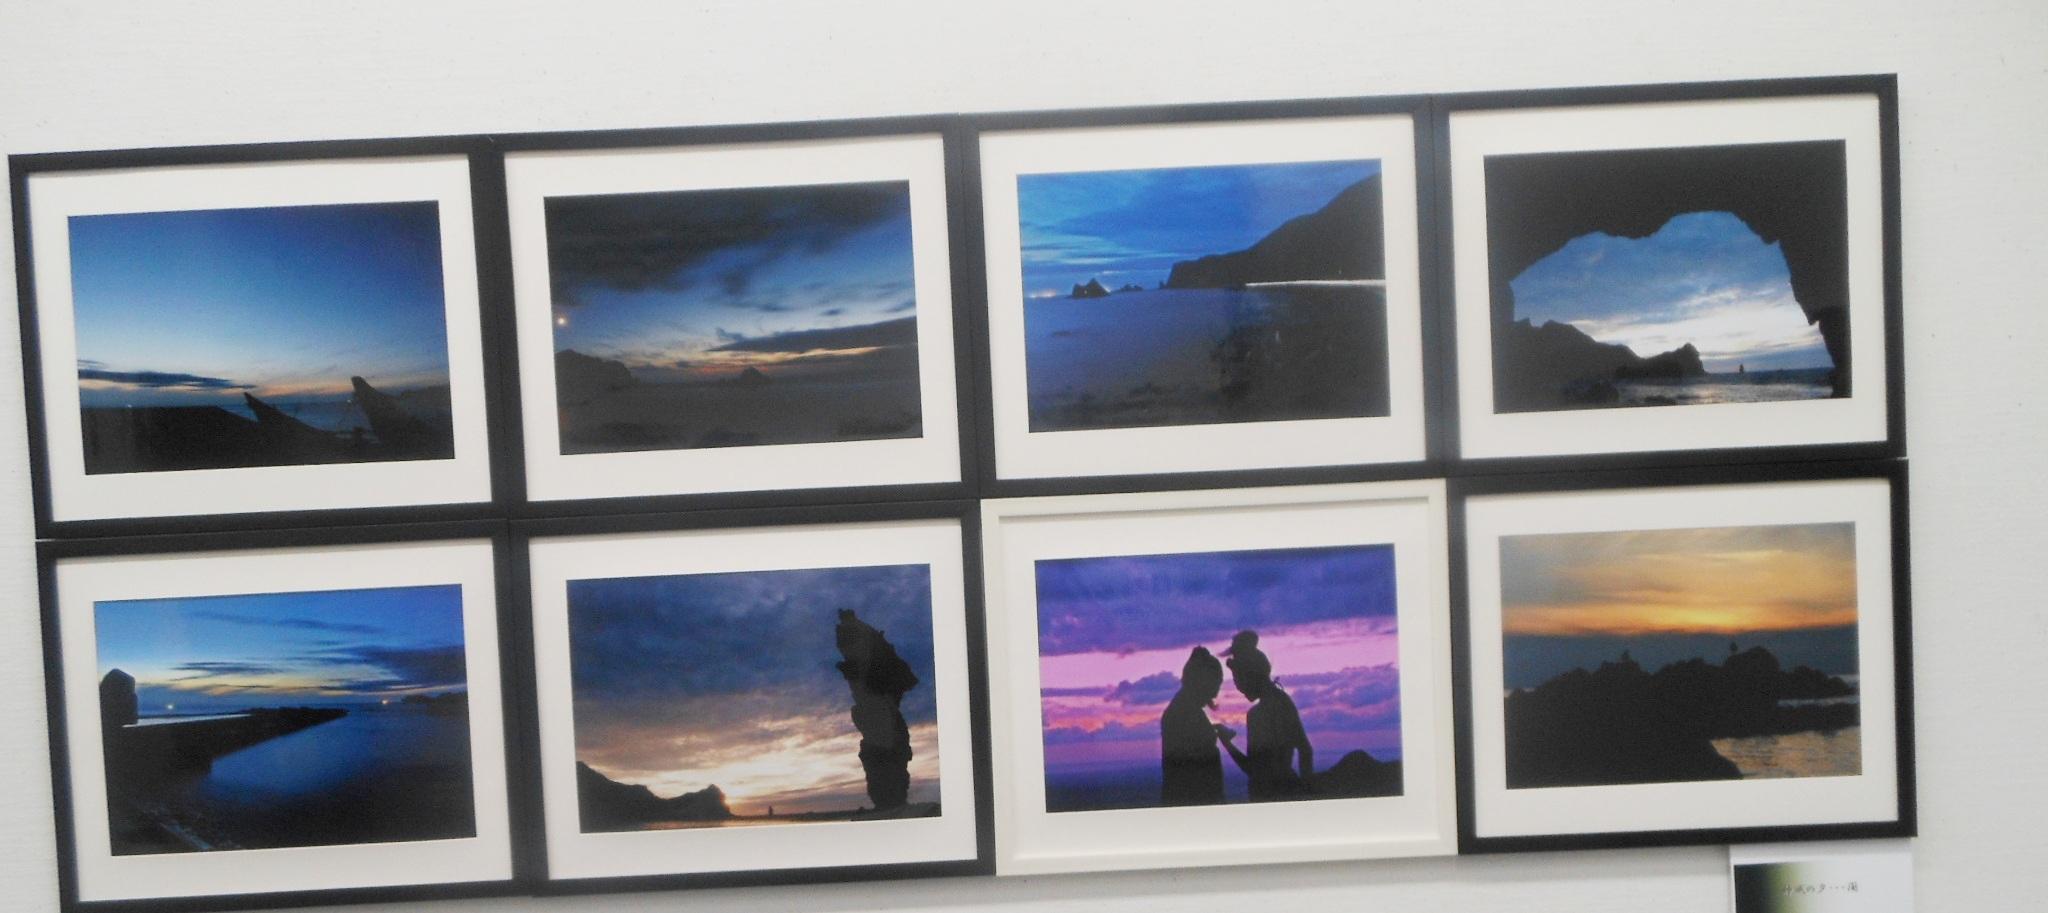 1885)②「写真クラブ「BePHaT!!」 第9回作品展 『夢 Photo 2012』」市民g. 終了11月21日(水)~11月25日(日)_f0126829_22252975.jpg